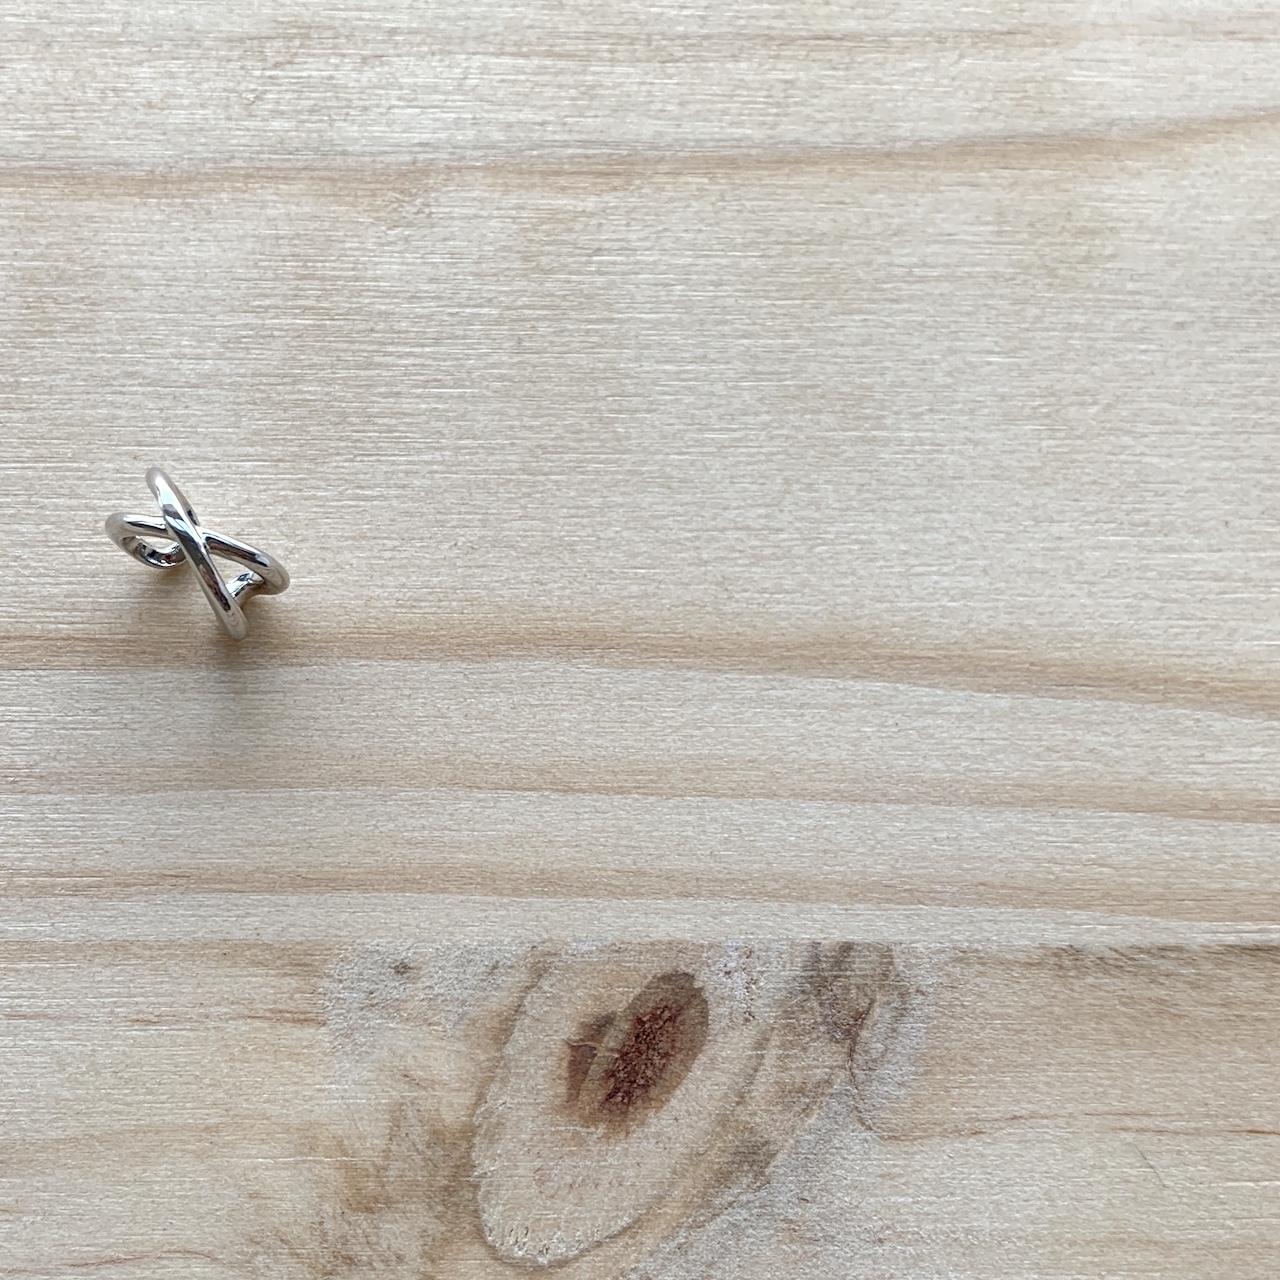 X Line Ear cuff クロスラインイヤーカフ #SP0212【STELLAPARK】